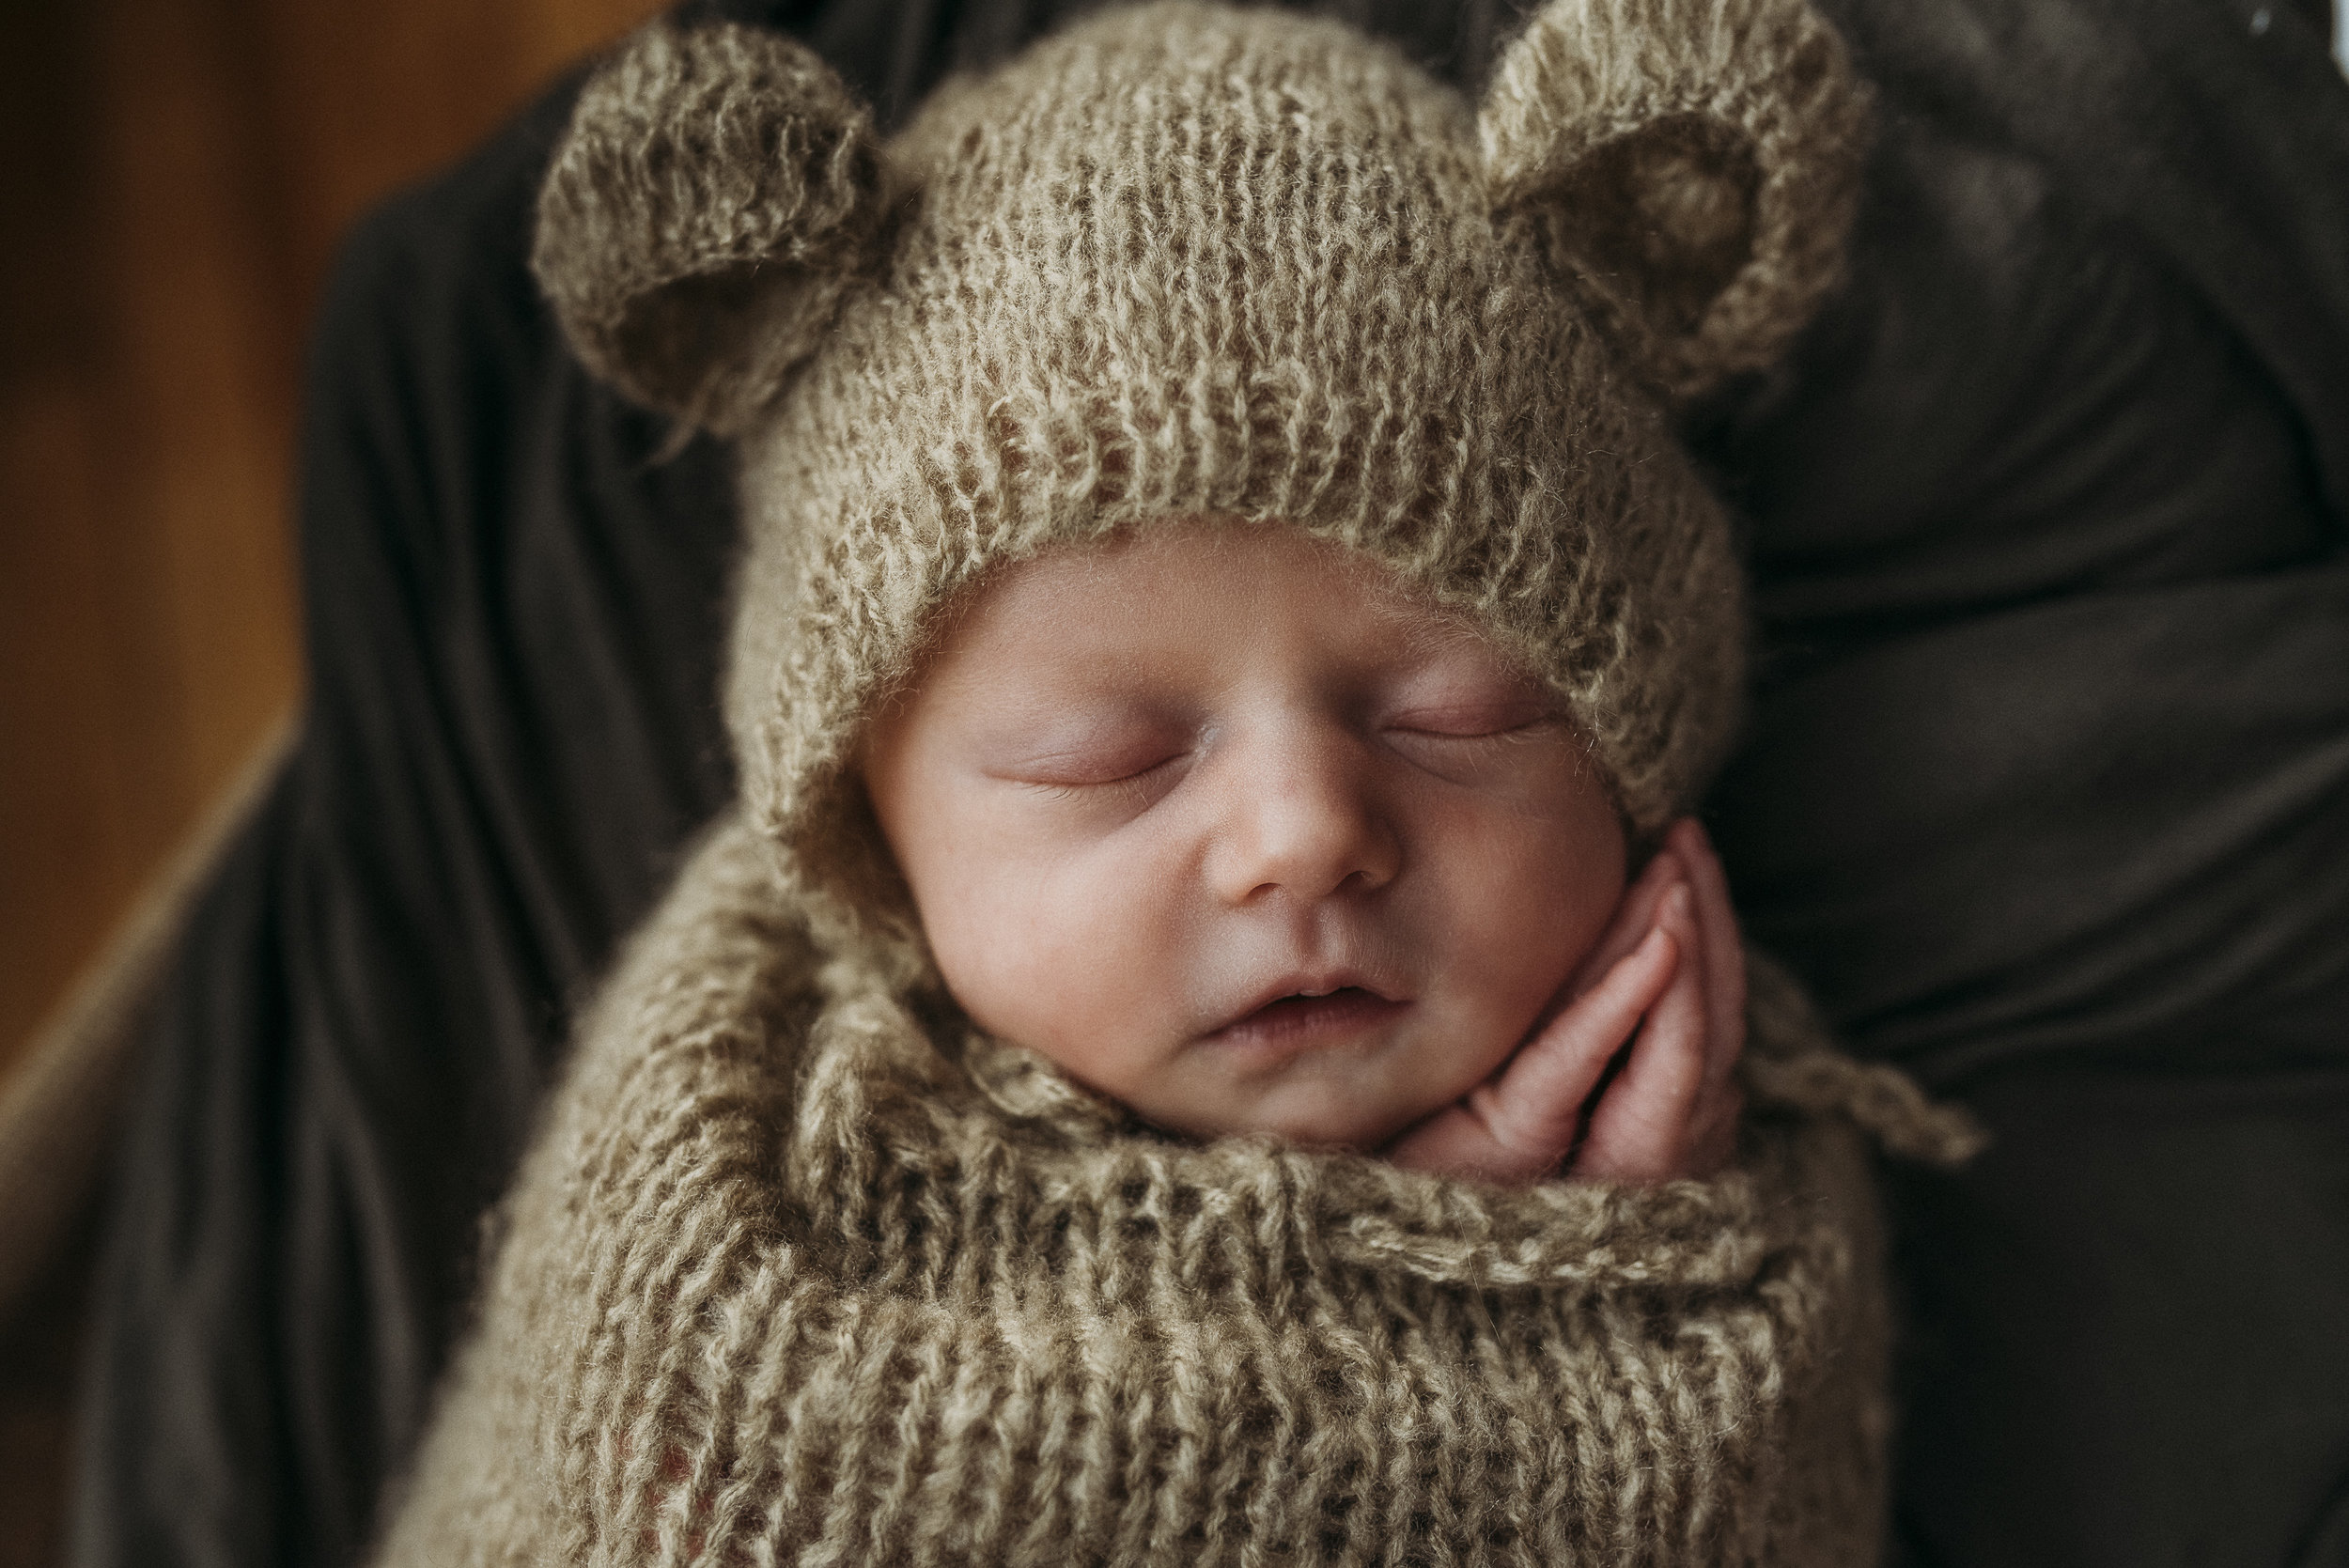 Maine newborn in home photography-12.jpg